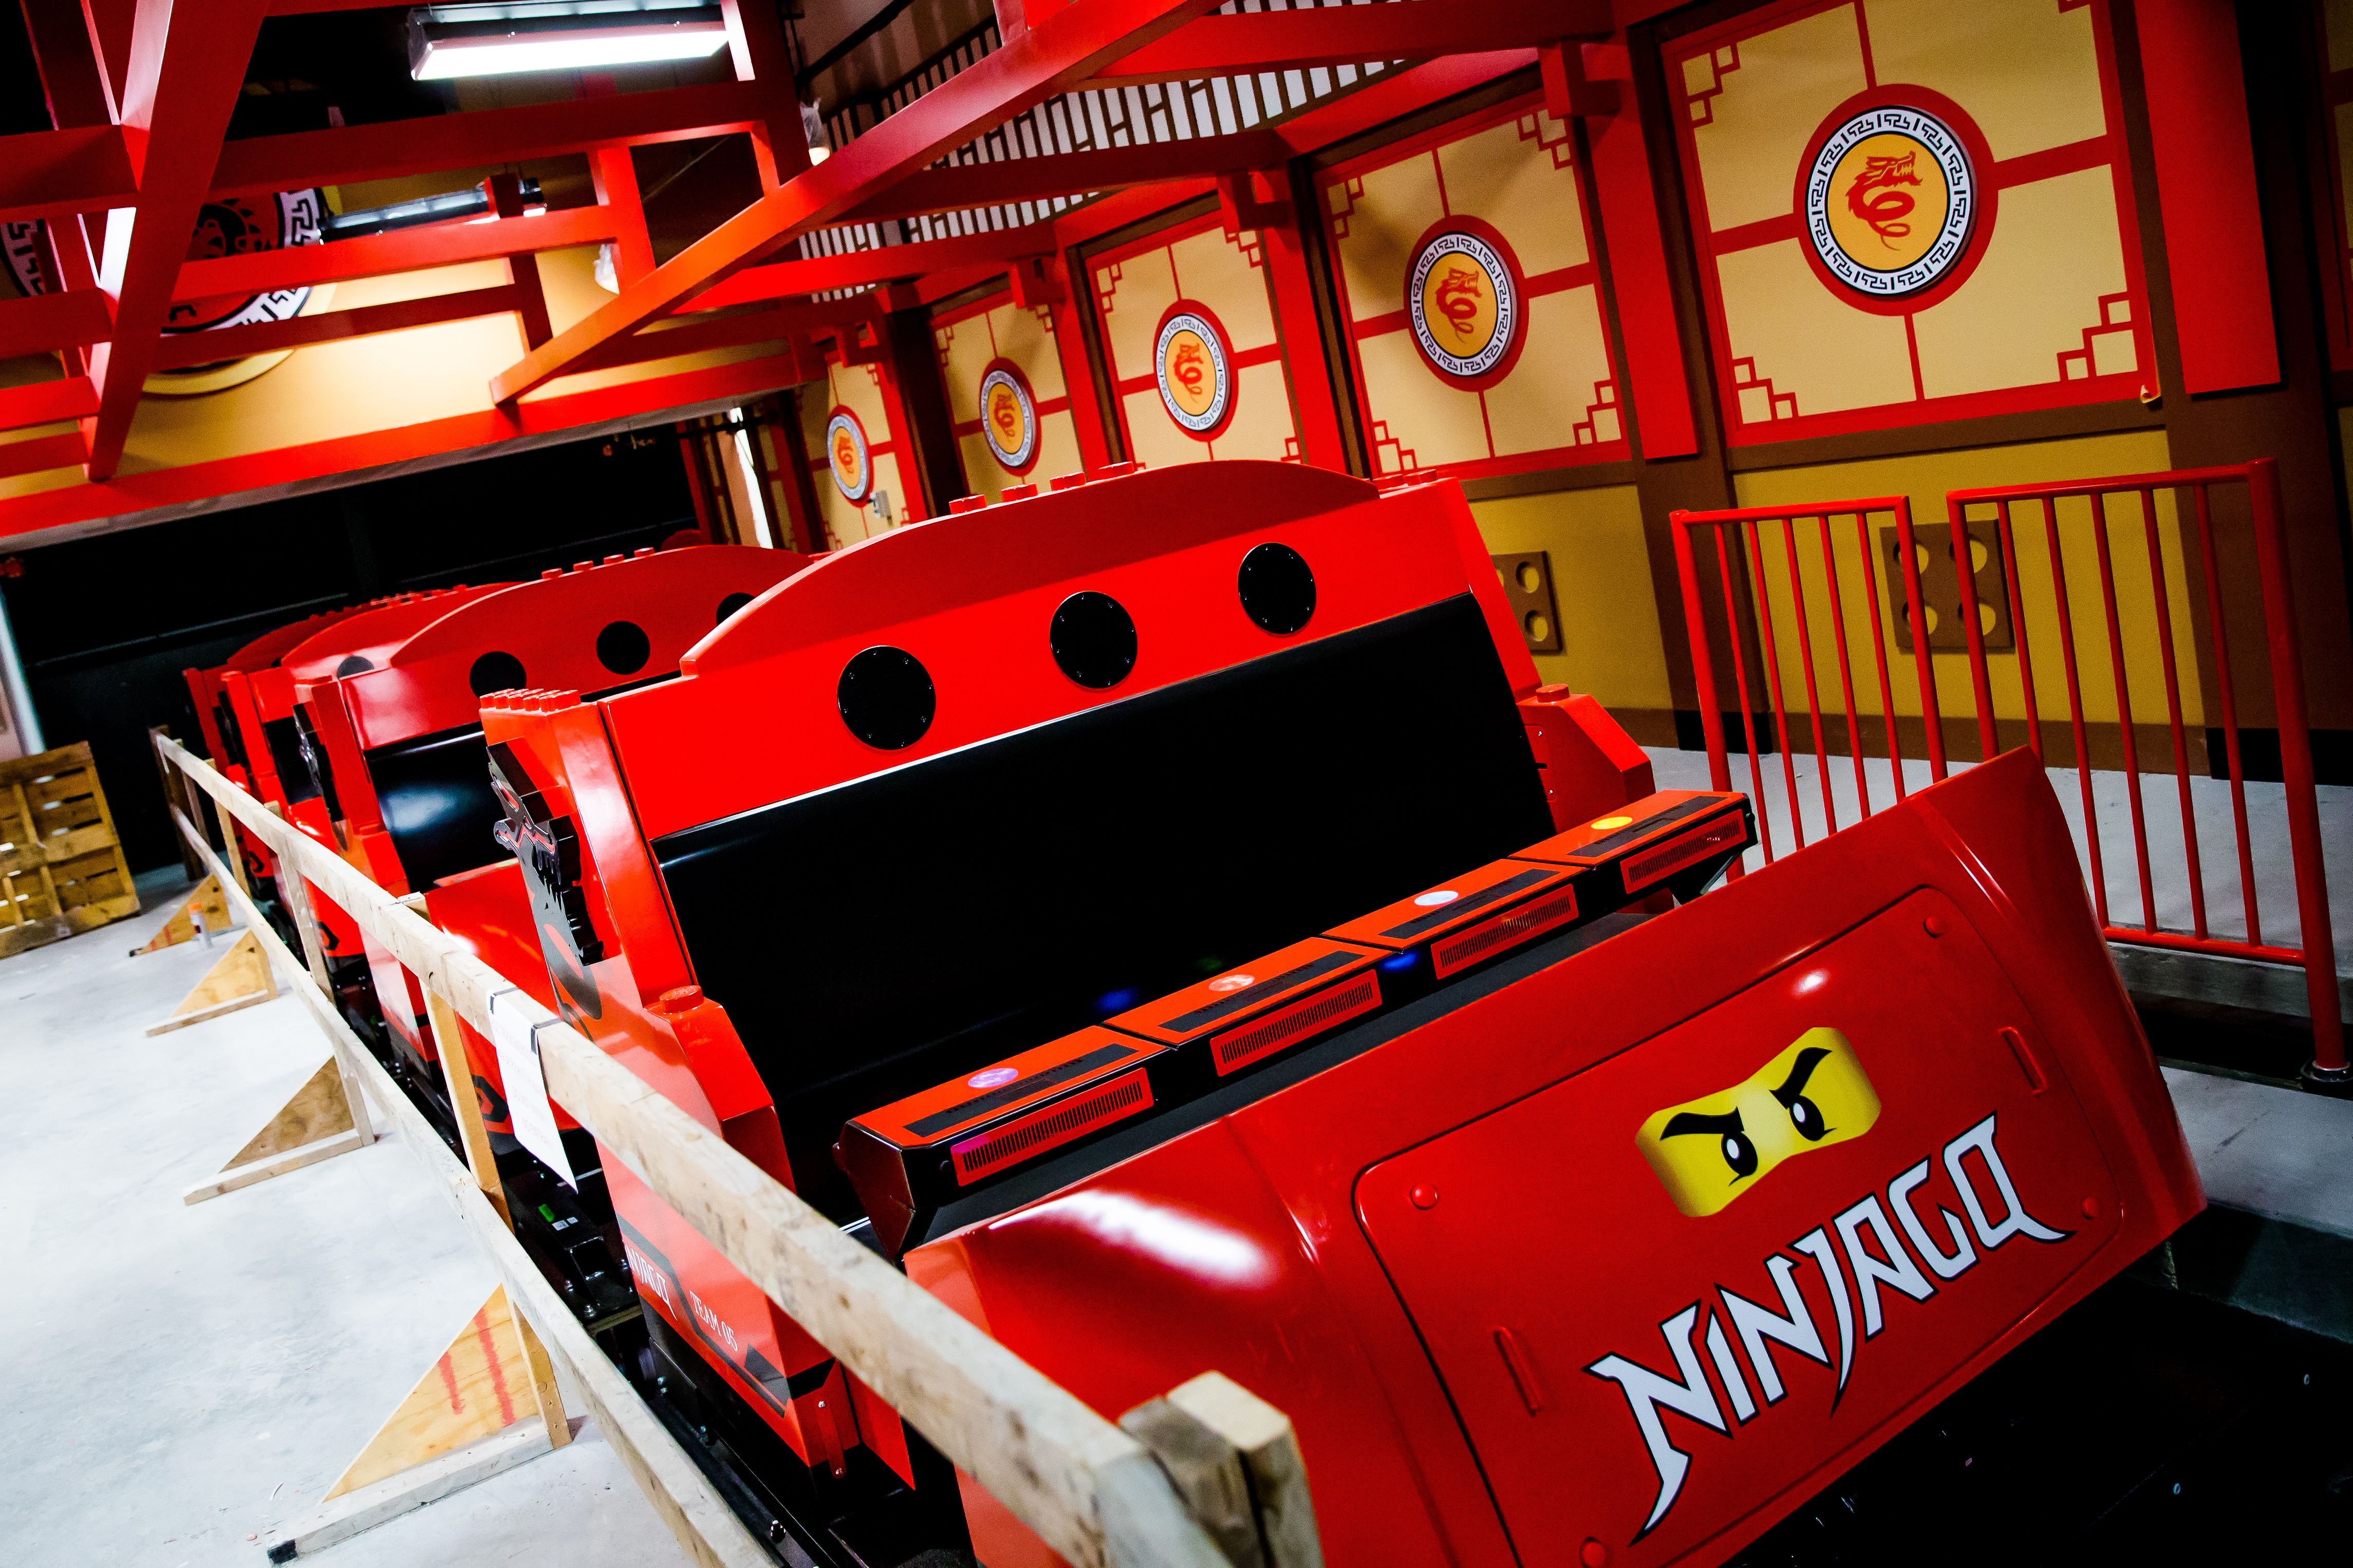 SNEAK PEEK: Train to 'become the ninja' when LEGO® NINJAGO® World opens Jan. 12!